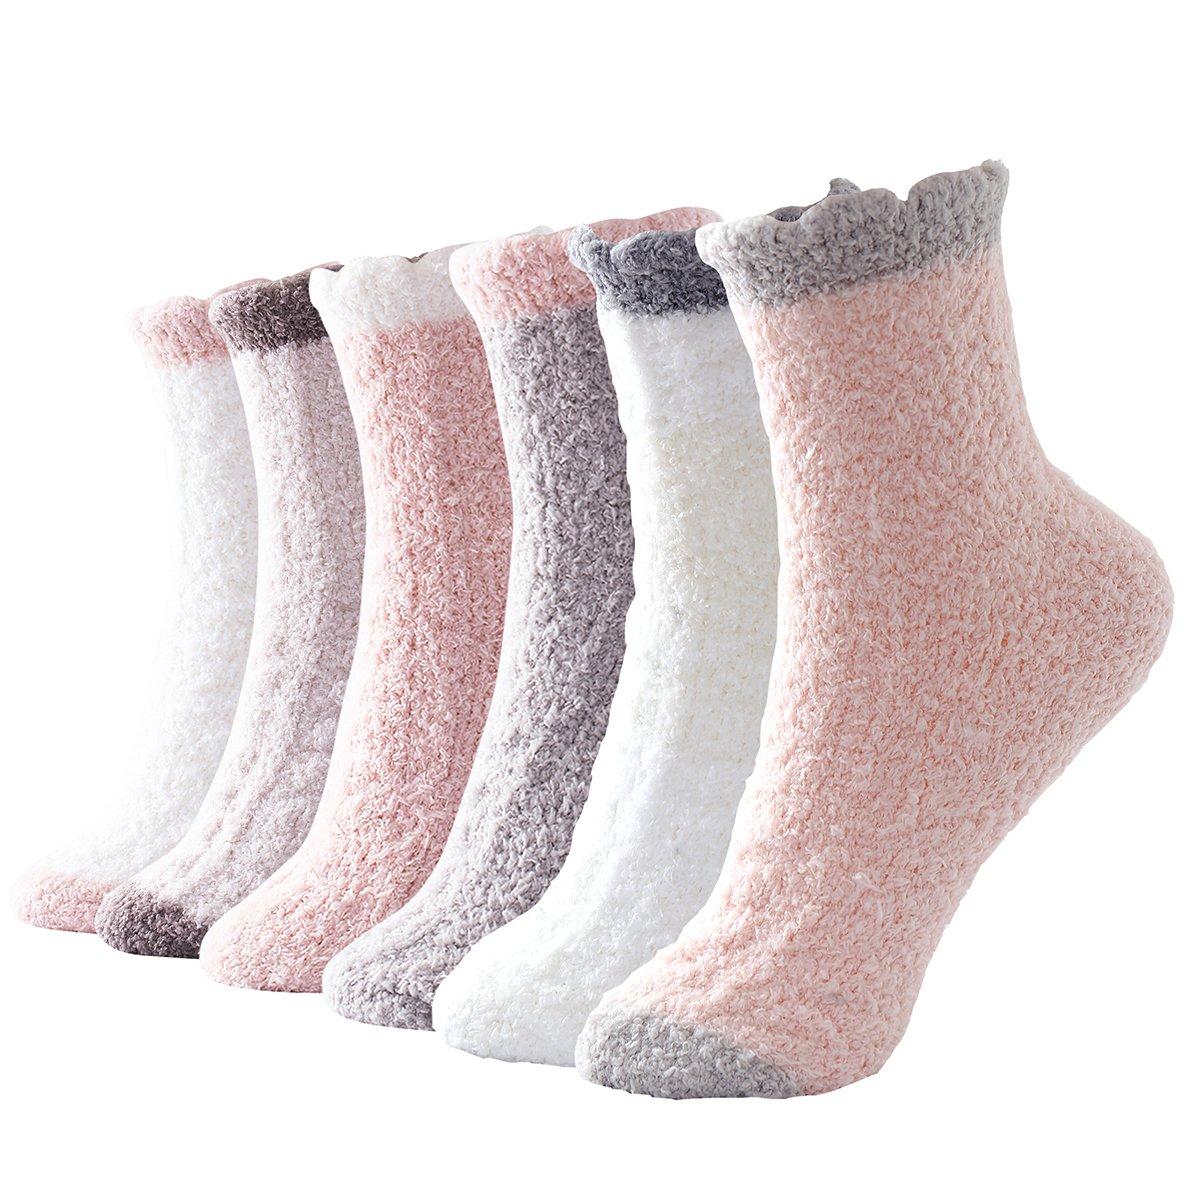 Beauttable Women Girls Premium Super Soft Toasty Plush Warm Fuzzy Microfiber Winter Socks Crew 6 Pairs (New Style Plain Color)